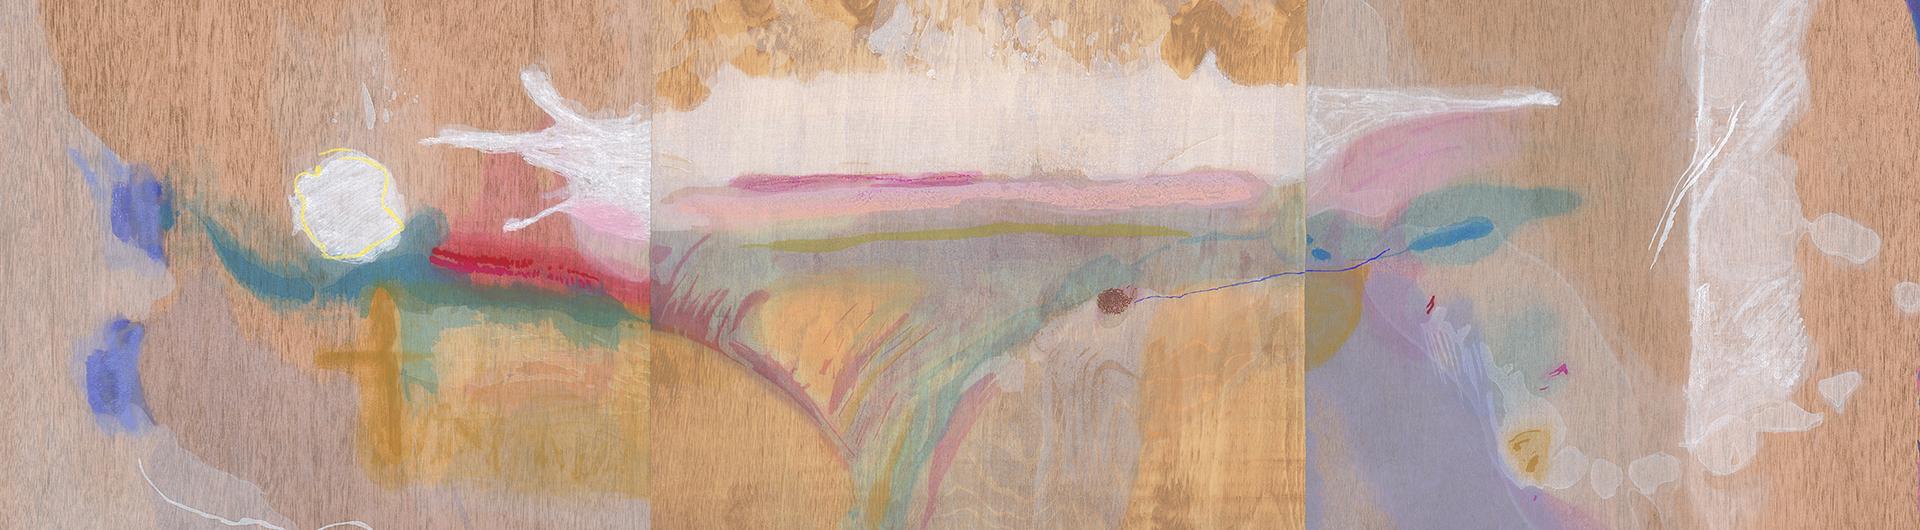 Helen Frankenthaler